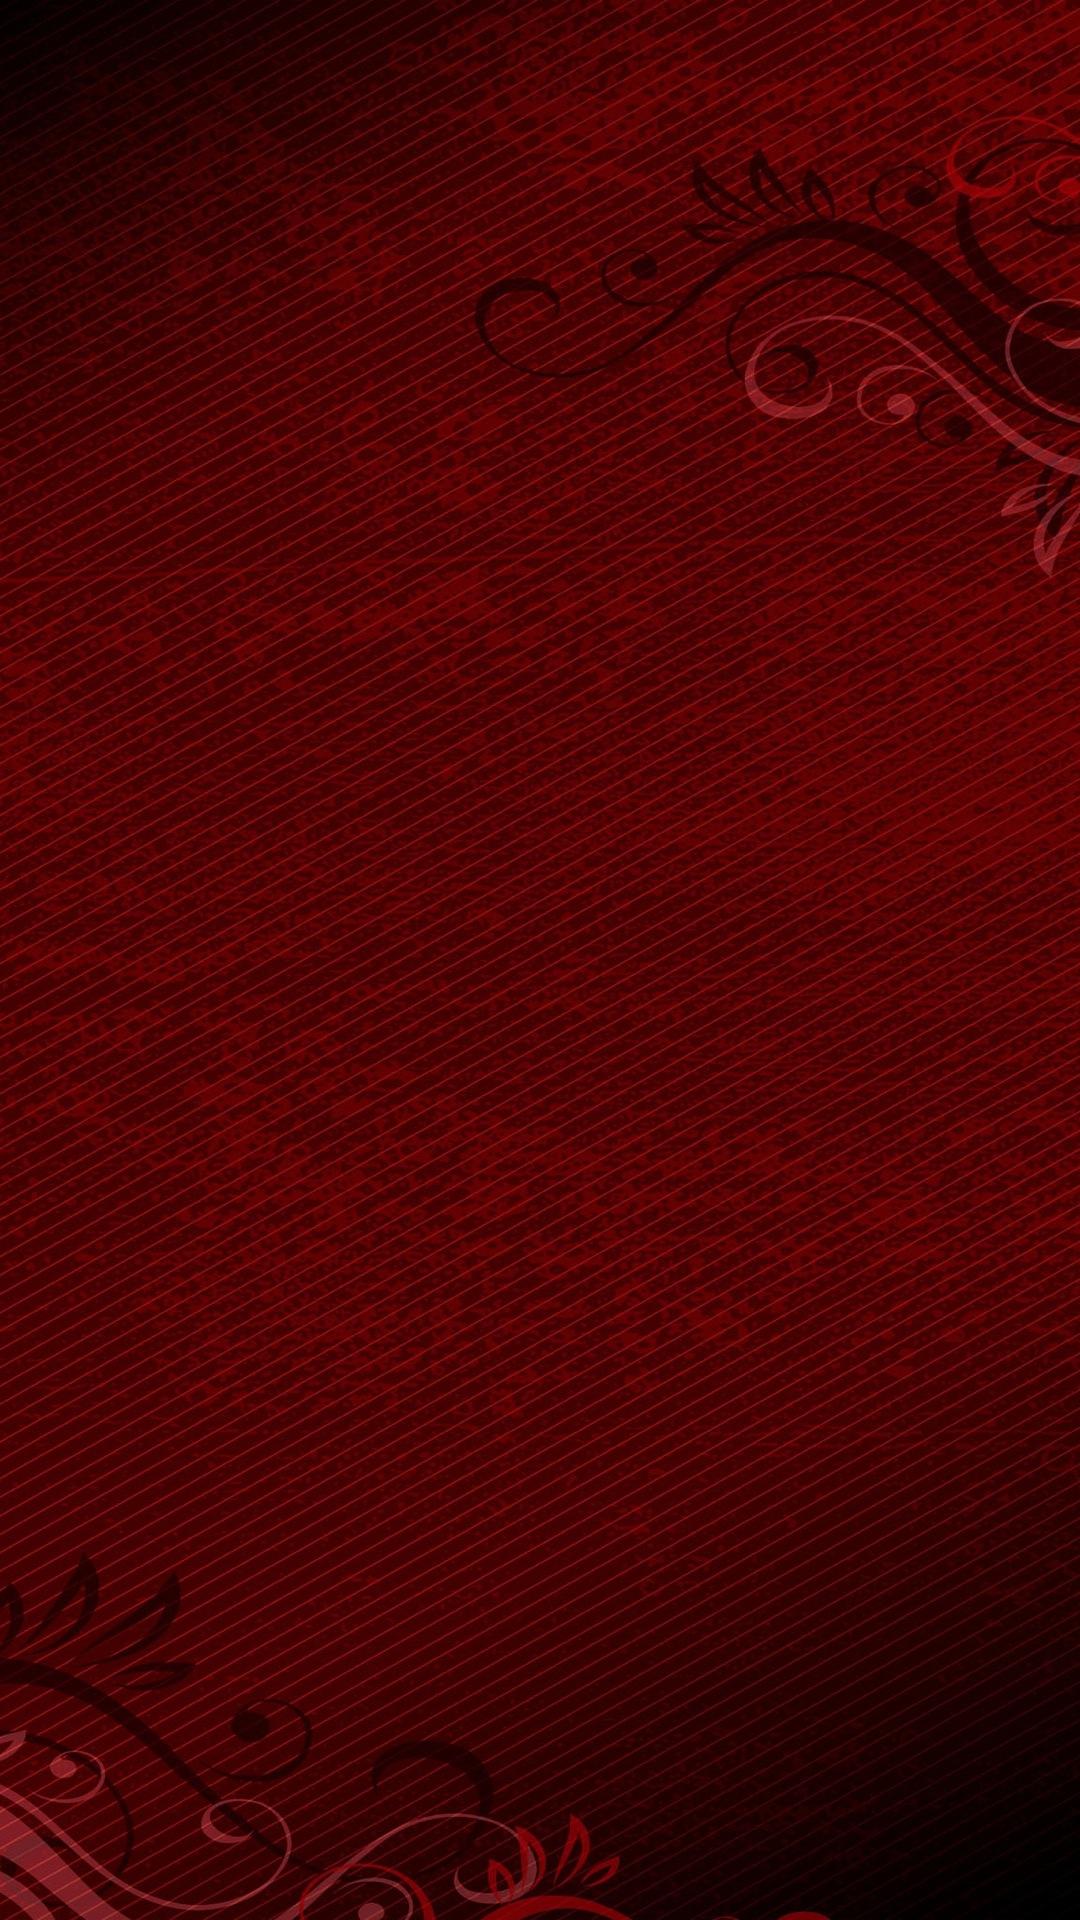 LINE Background Wallpaper 03194のLINE背景画像壁紙